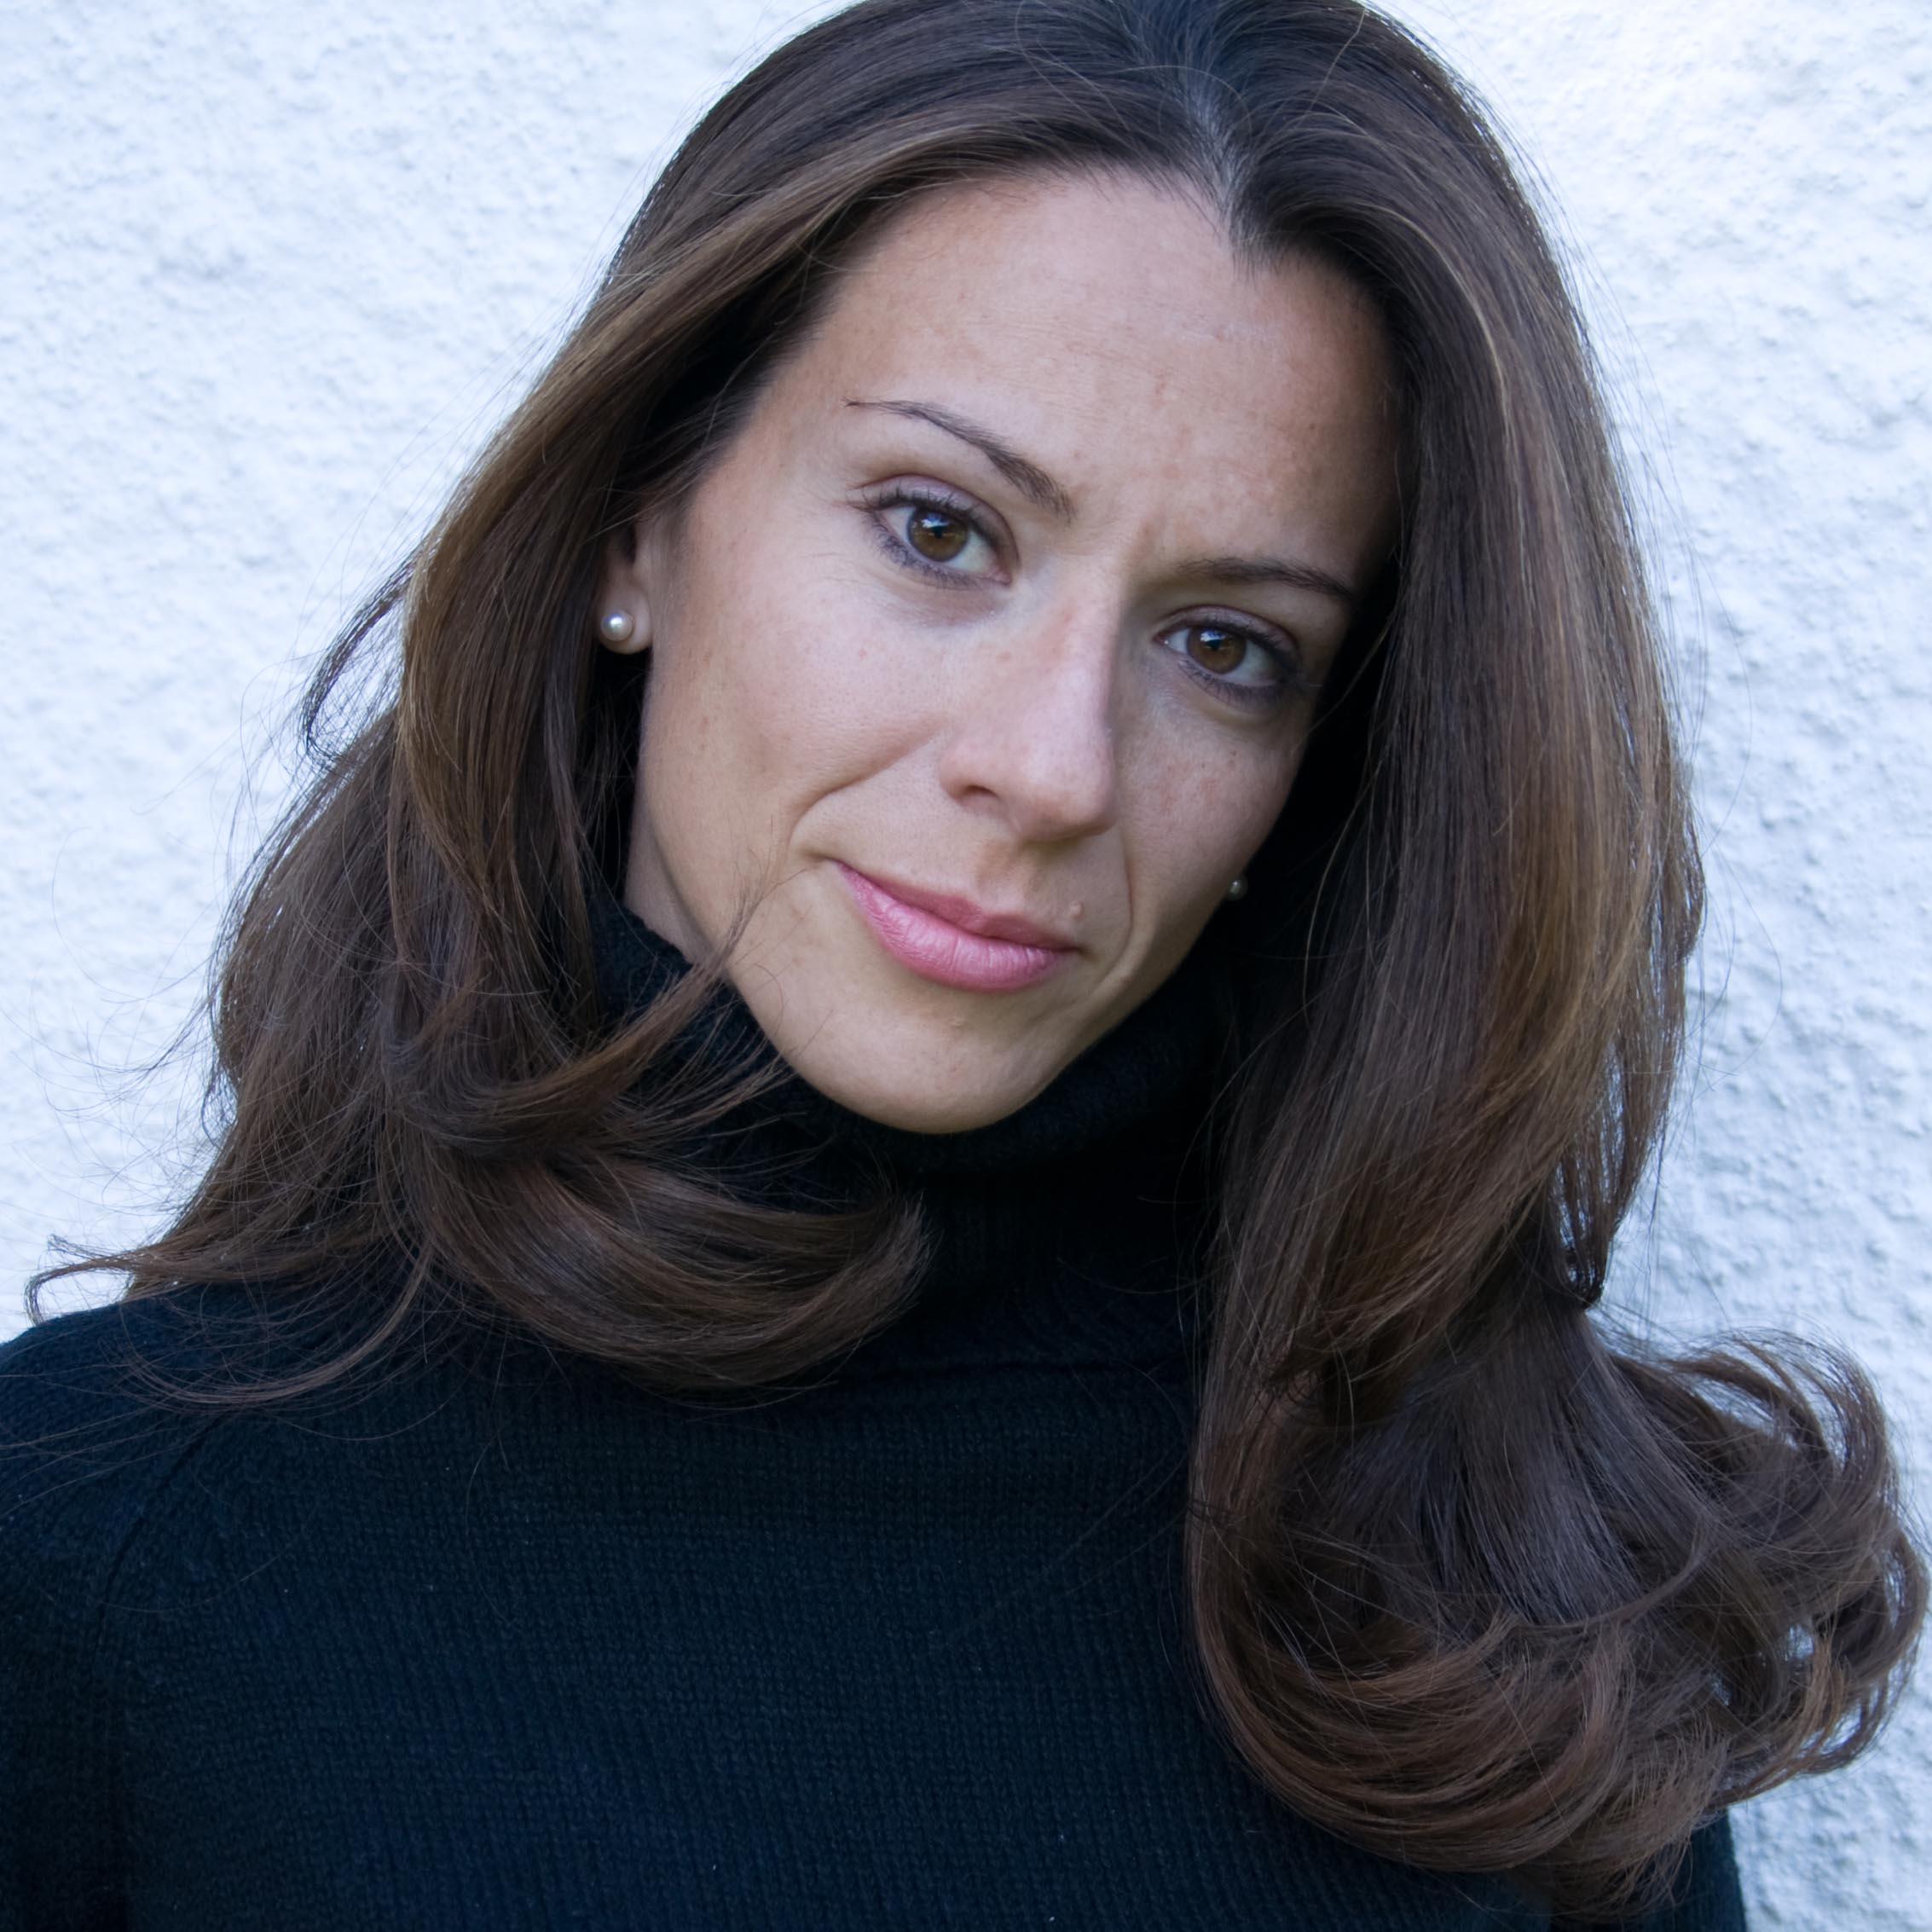 Eva Mª Martínez